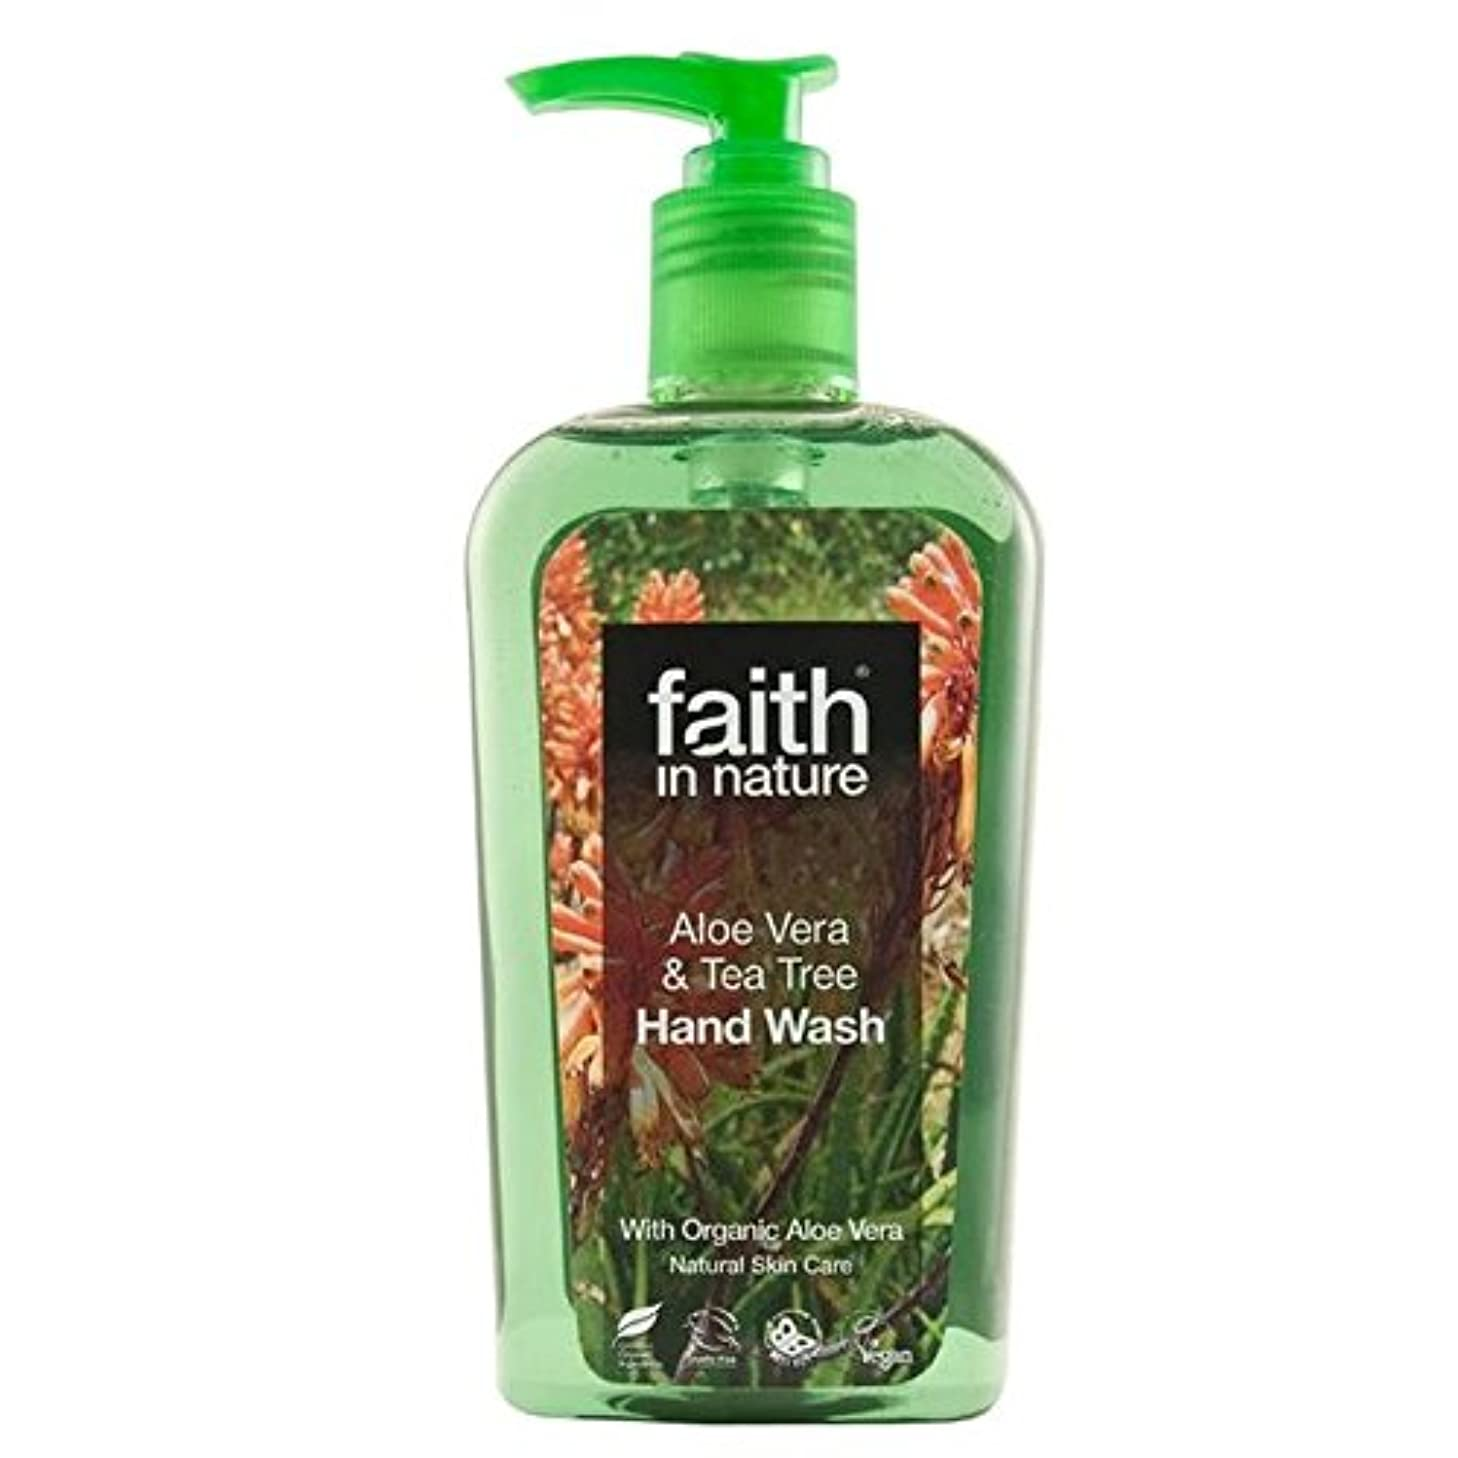 Faith in Nature Aloe Vera & Tea Tree Handwash 300ml - (Faith In Nature) 自然のアロエベラ&ティーツリー手洗いの300ミリリットルの信仰 [並行輸入品]